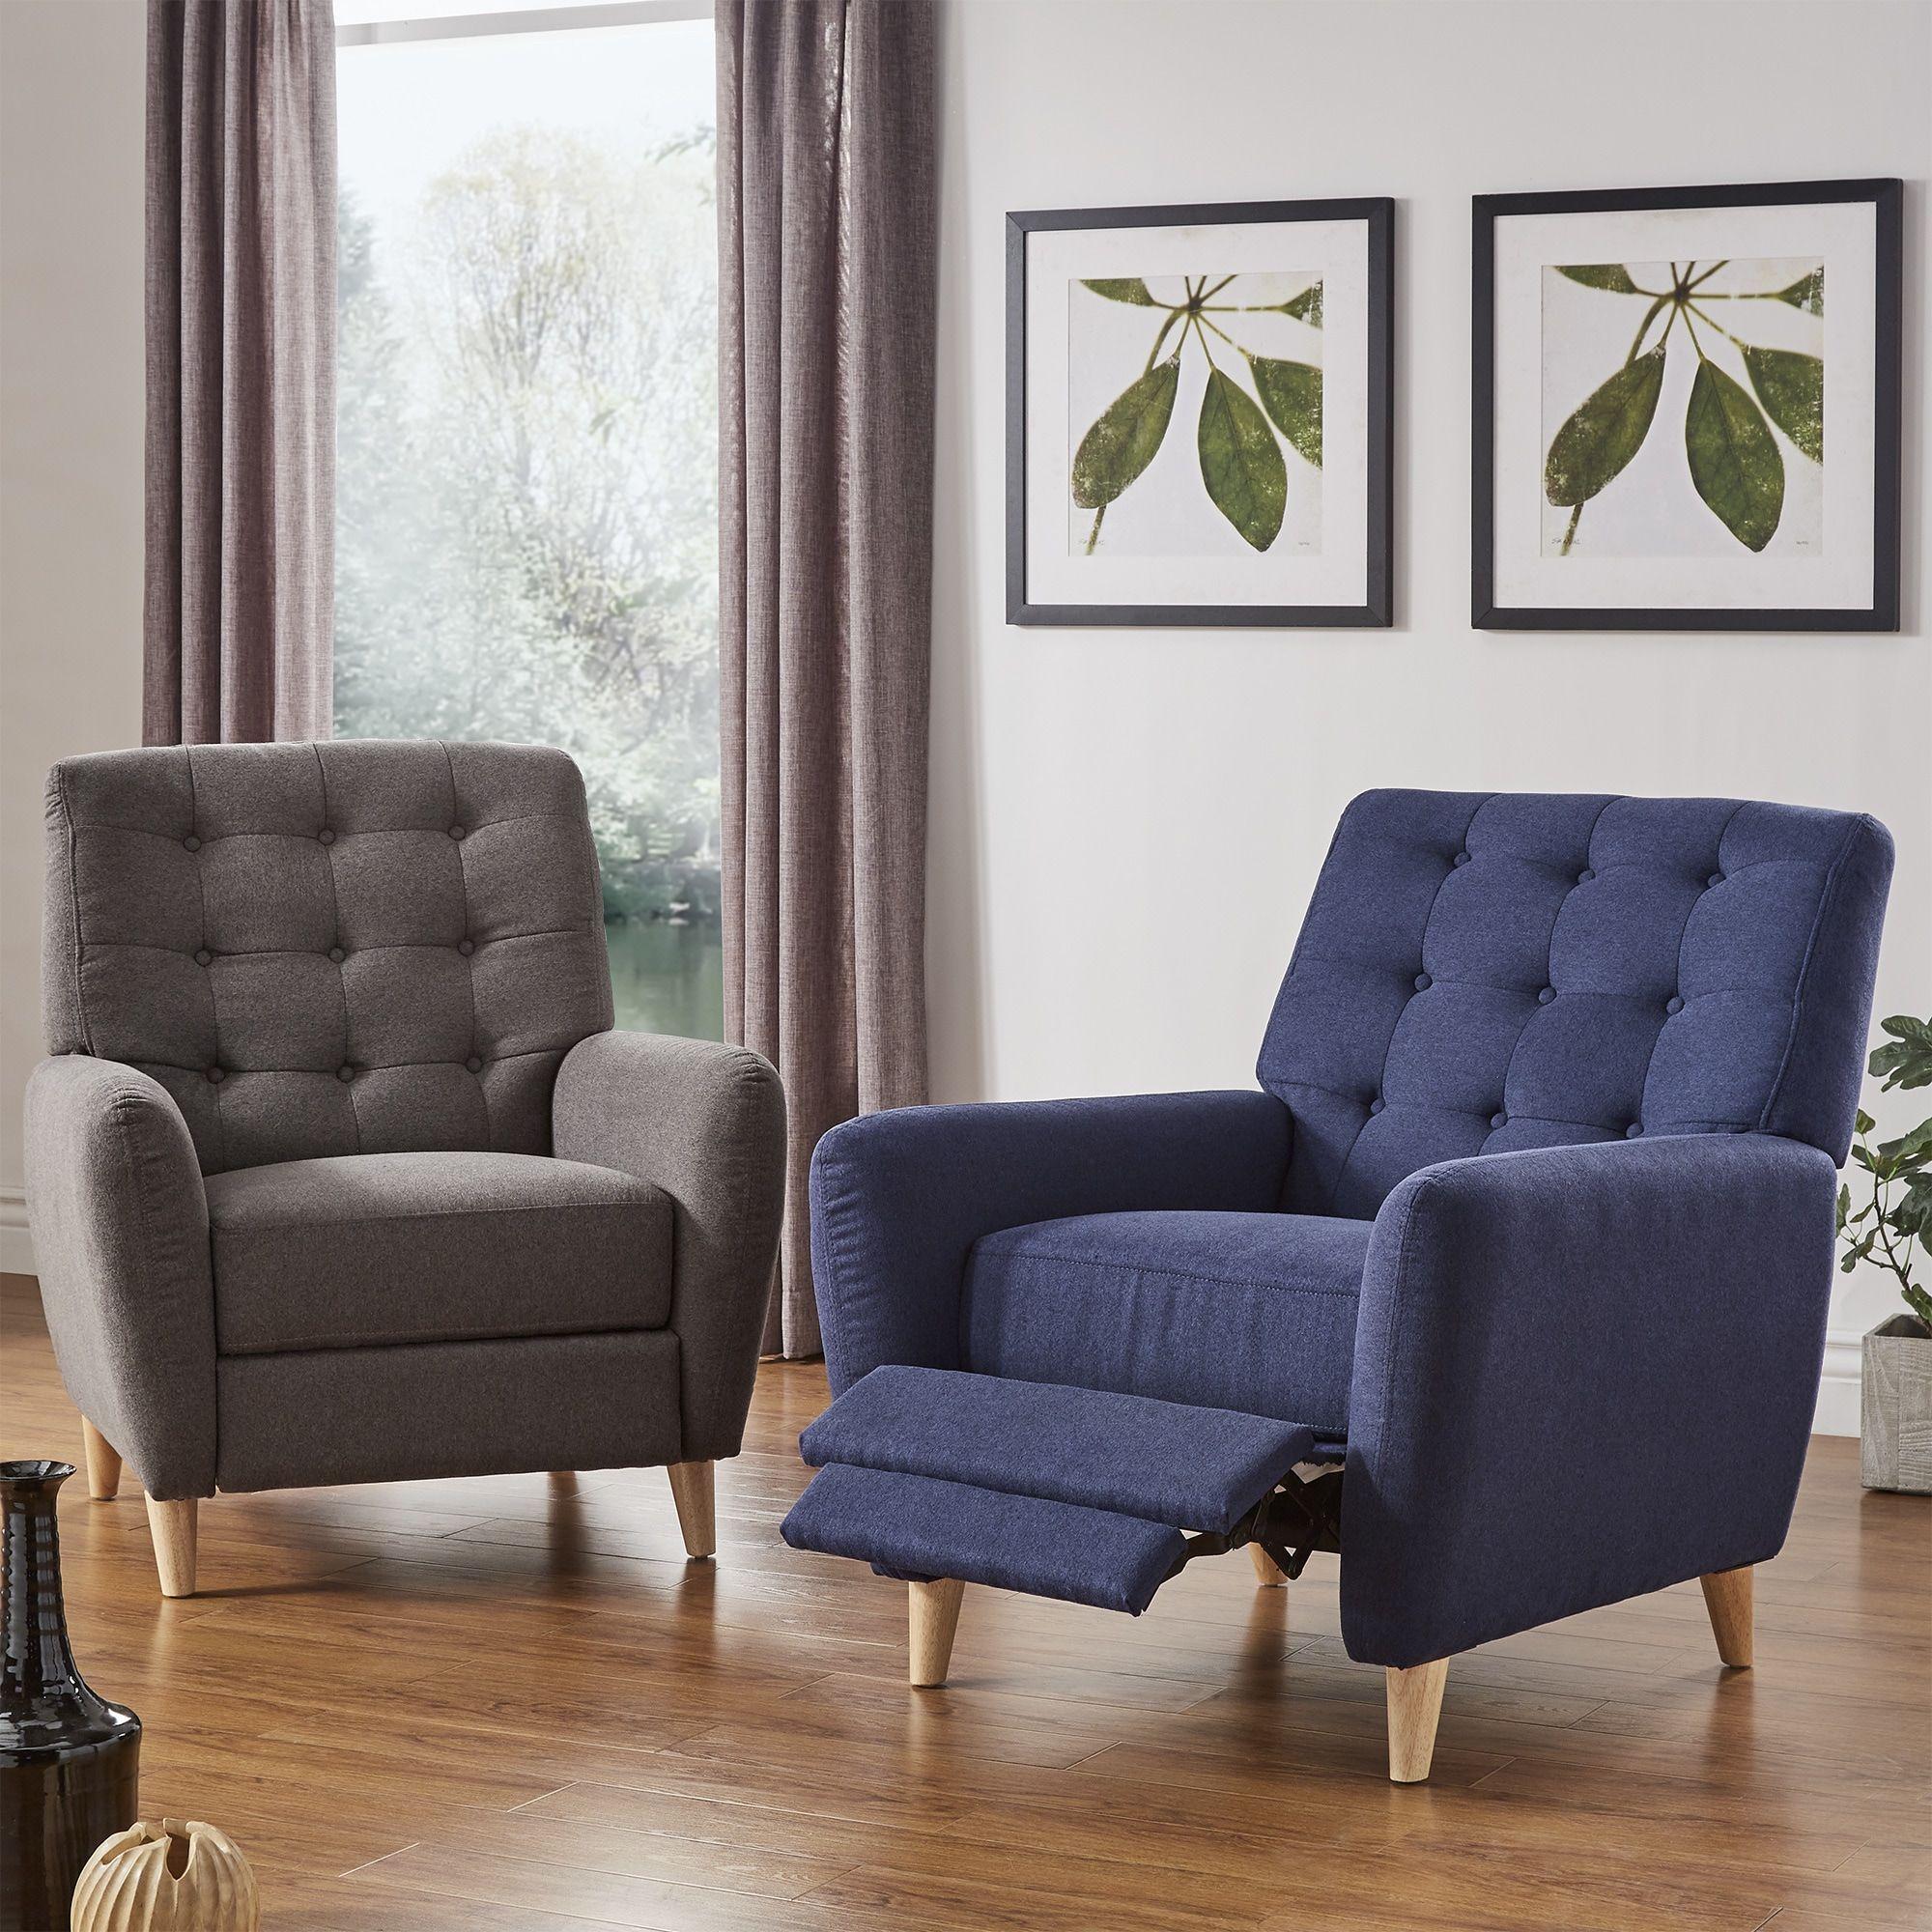 niels danish modern tufted recliner chair by inspire q modern rh pinterest com